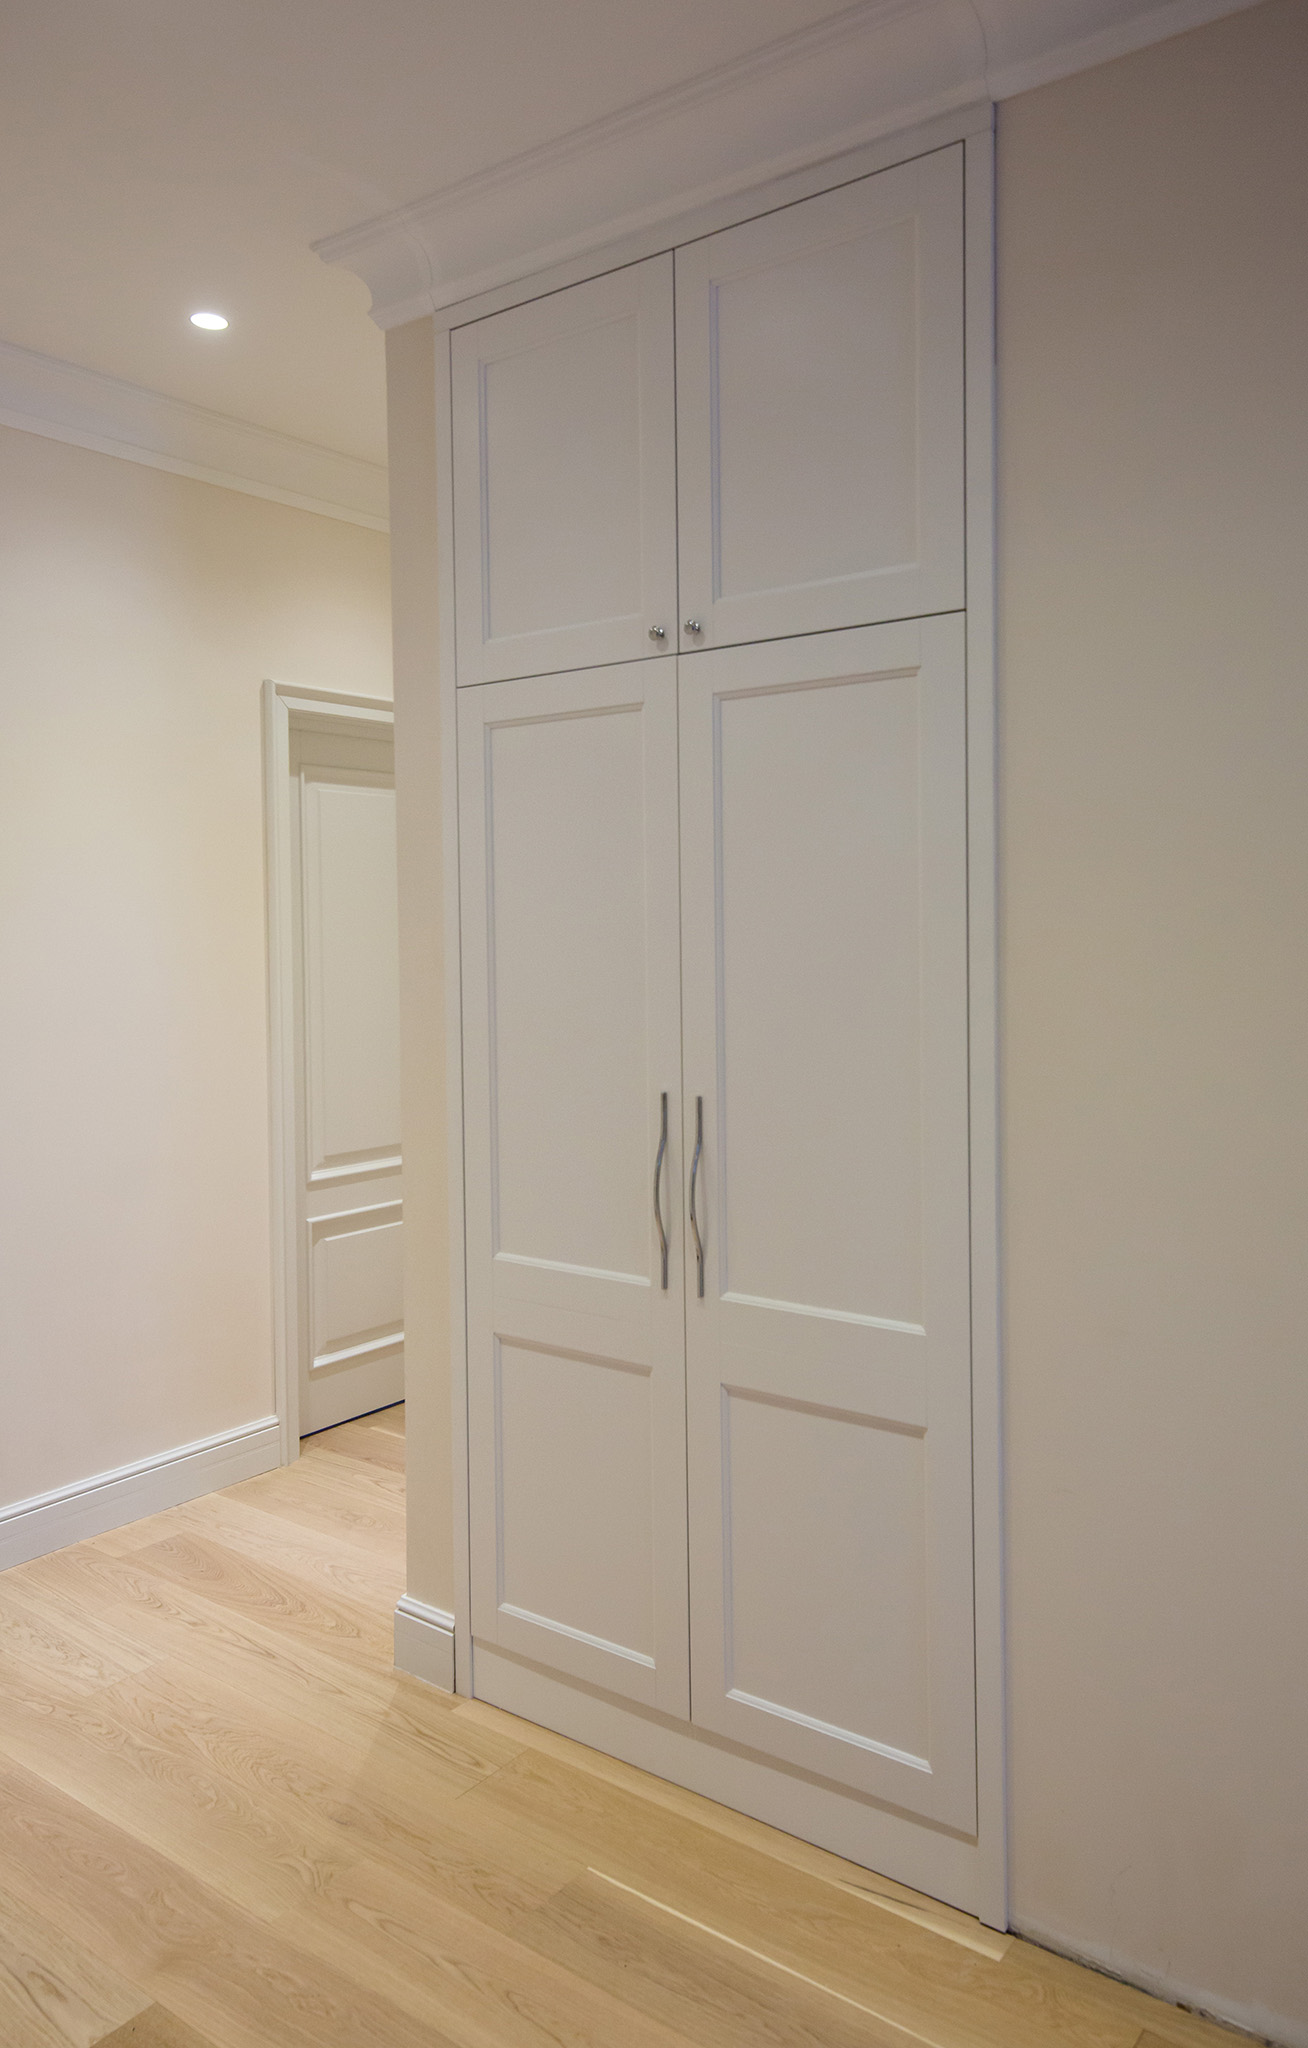 fitted wardrobes, shaker wardrobe doors, custom wardrobe